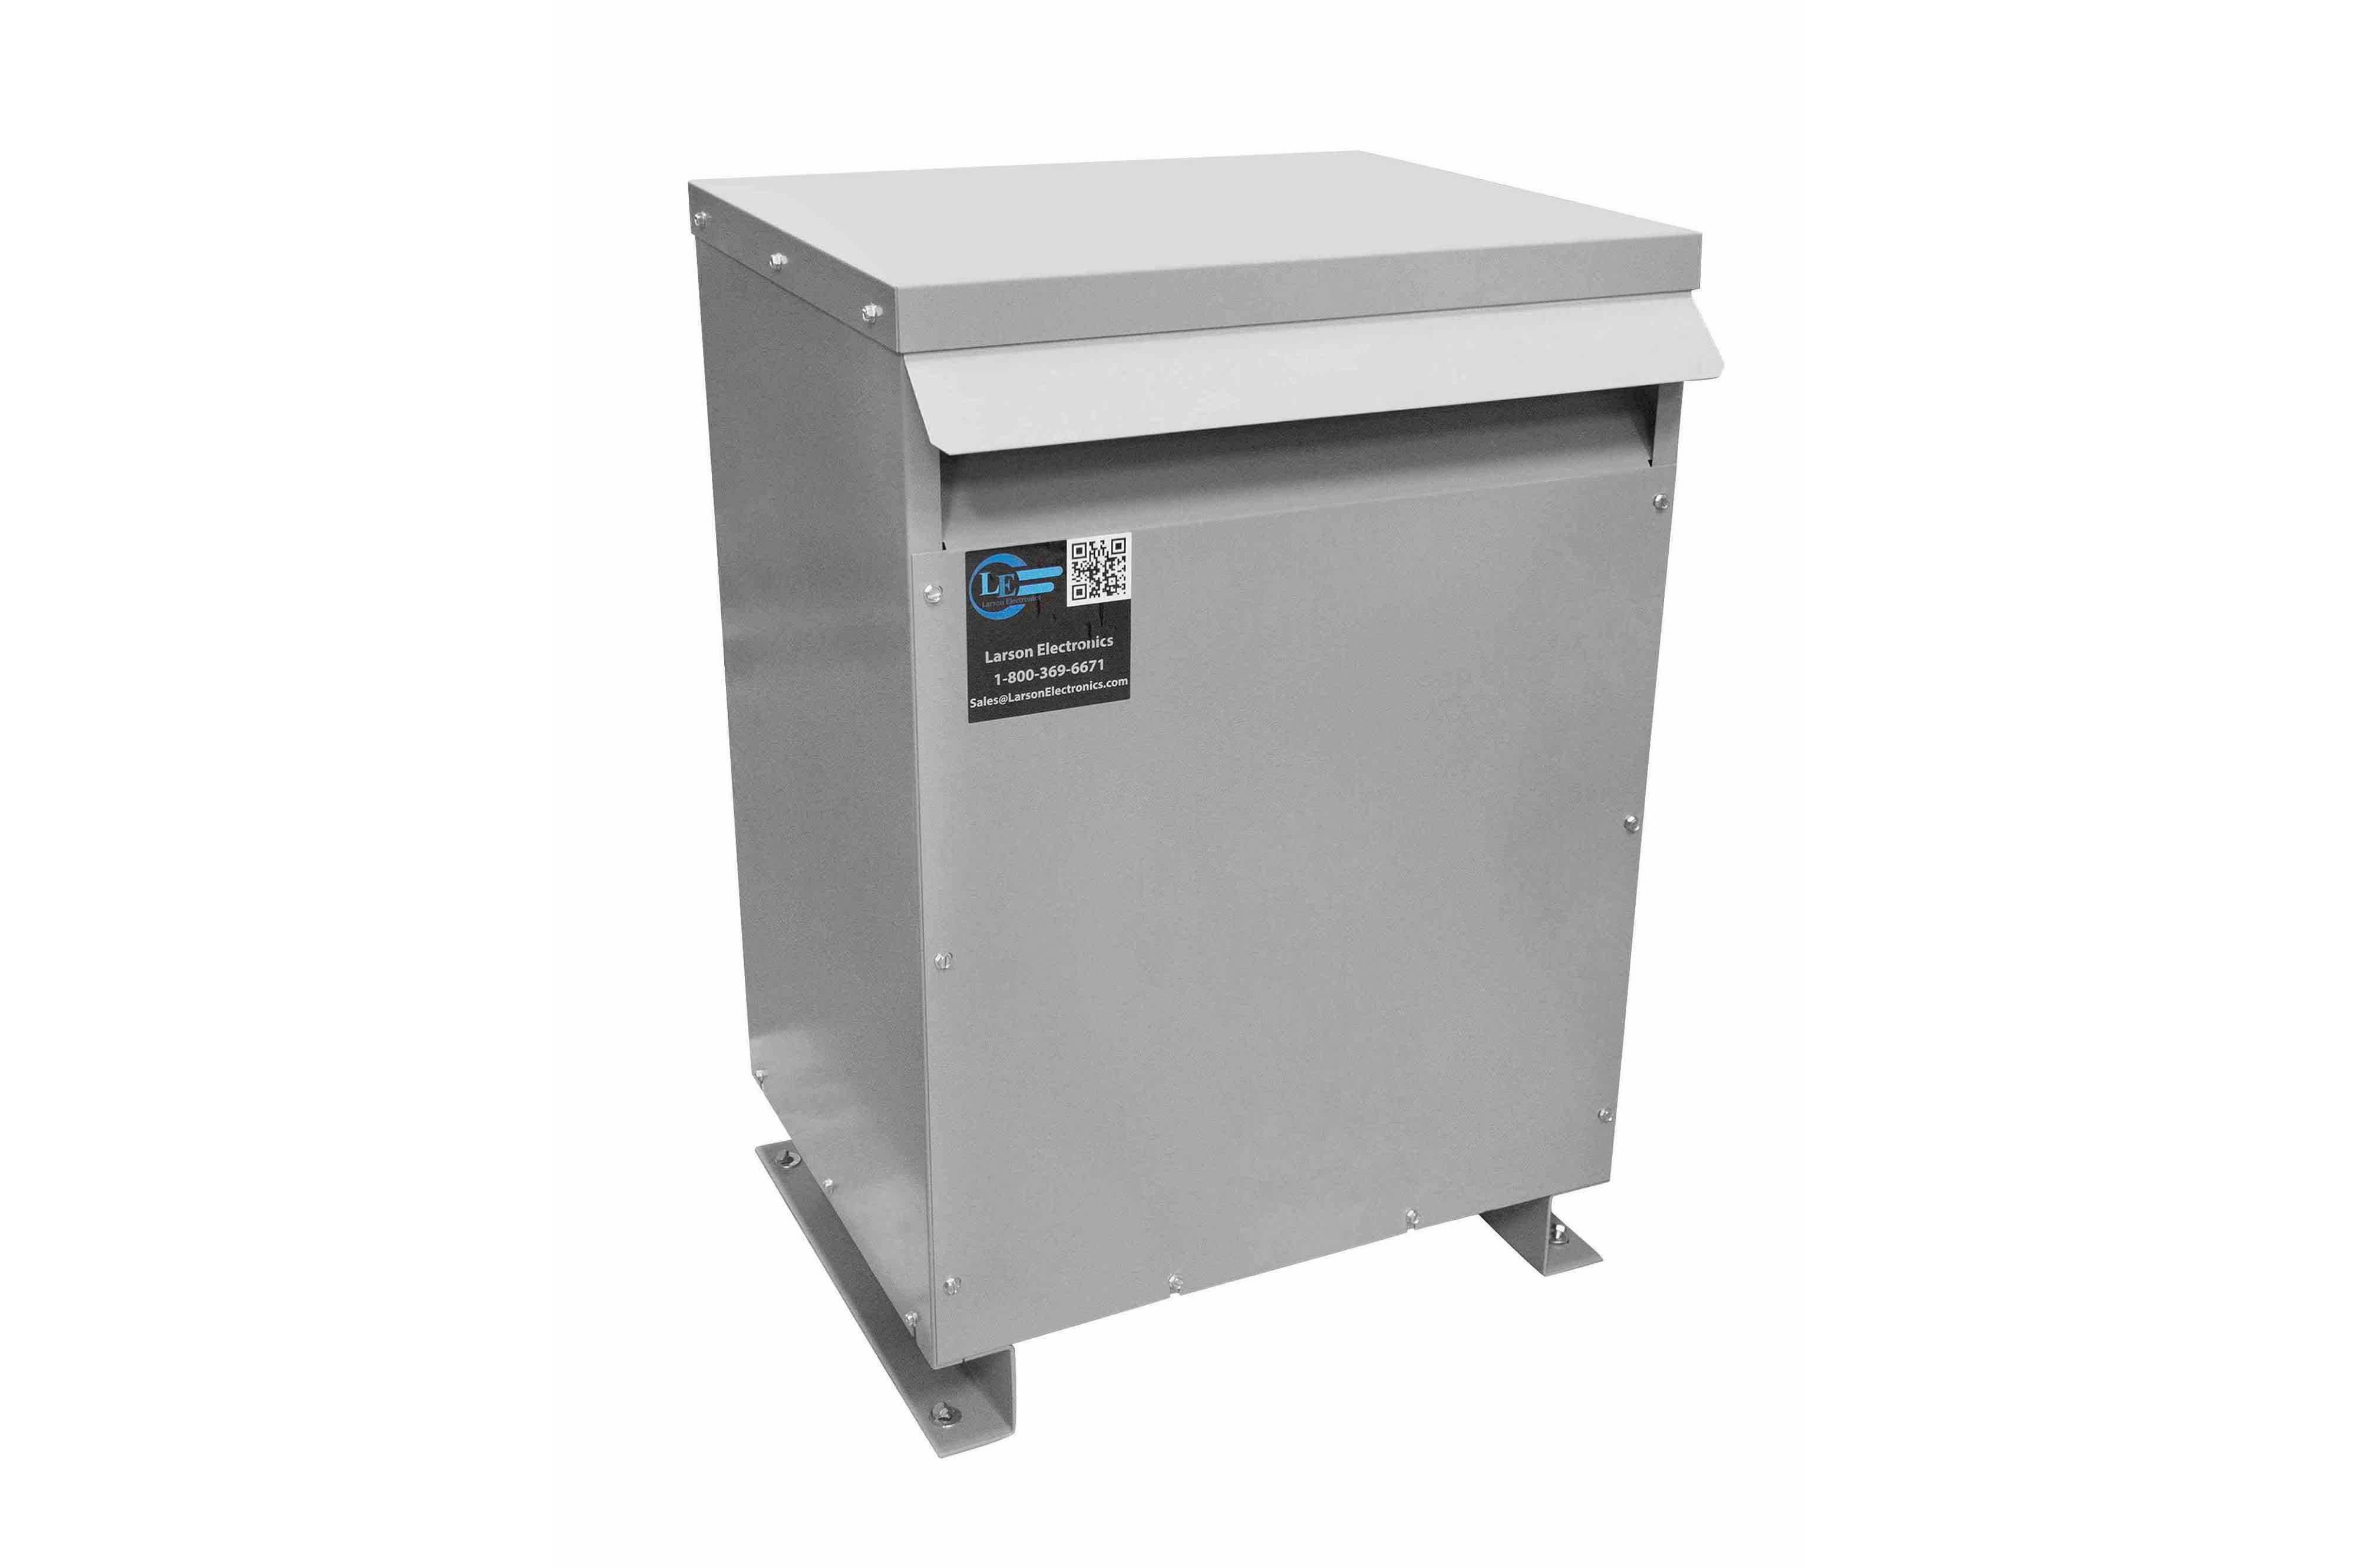 600 kVA 3PH Isolation Transformer, 480V Wye Primary, 380V Delta Secondary, N3R, Ventilated, 60 Hz